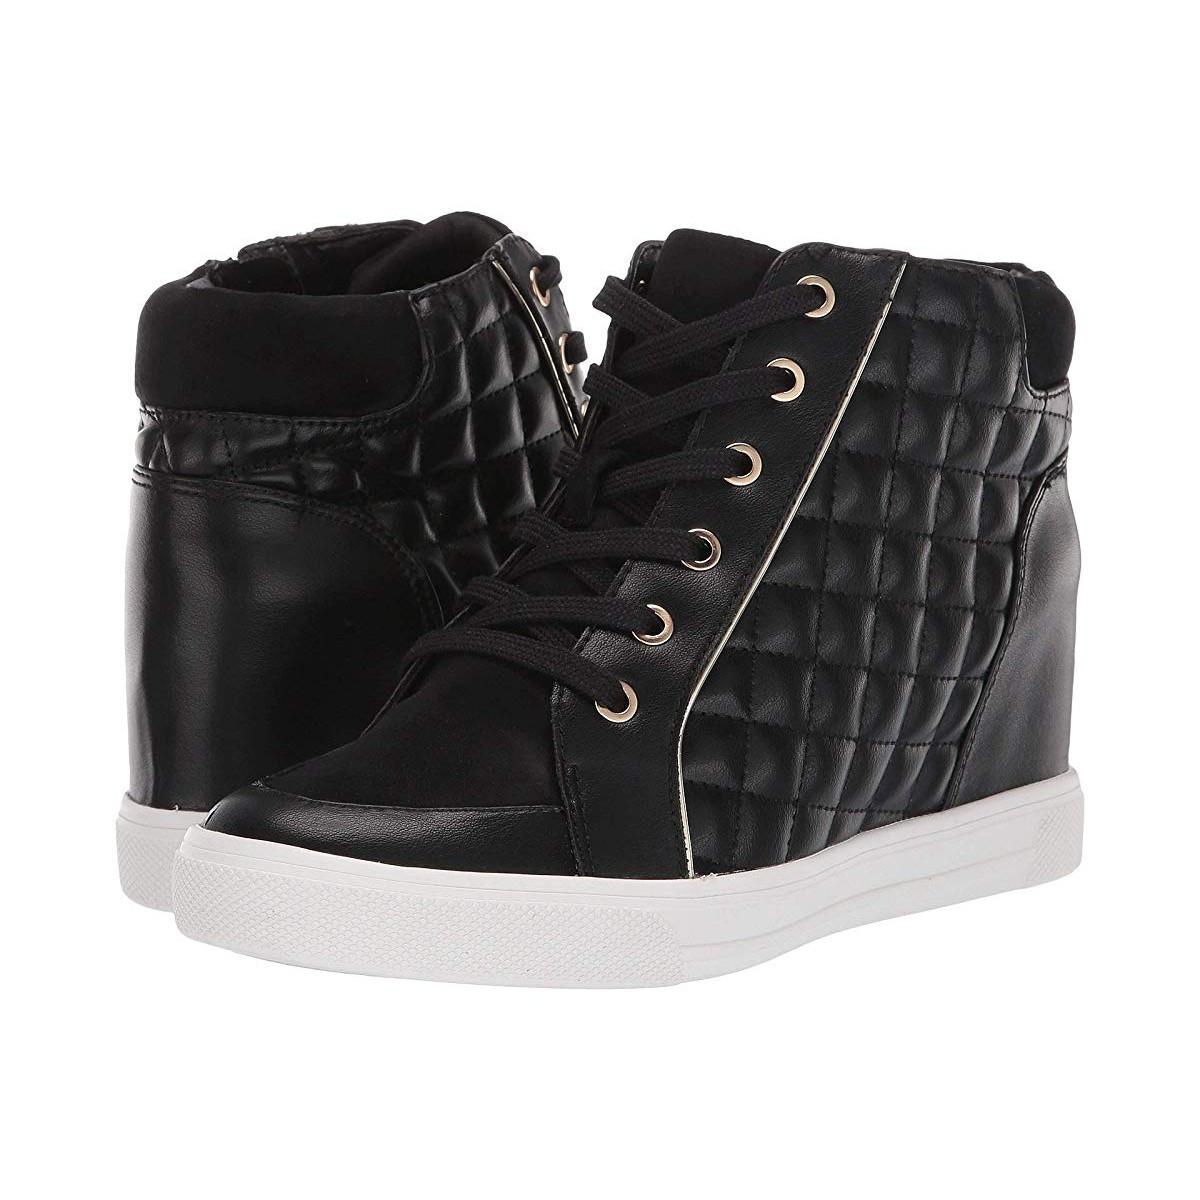 Кроссовки на молнии ALDO Nebrinia Black - Оригинал, фото 1